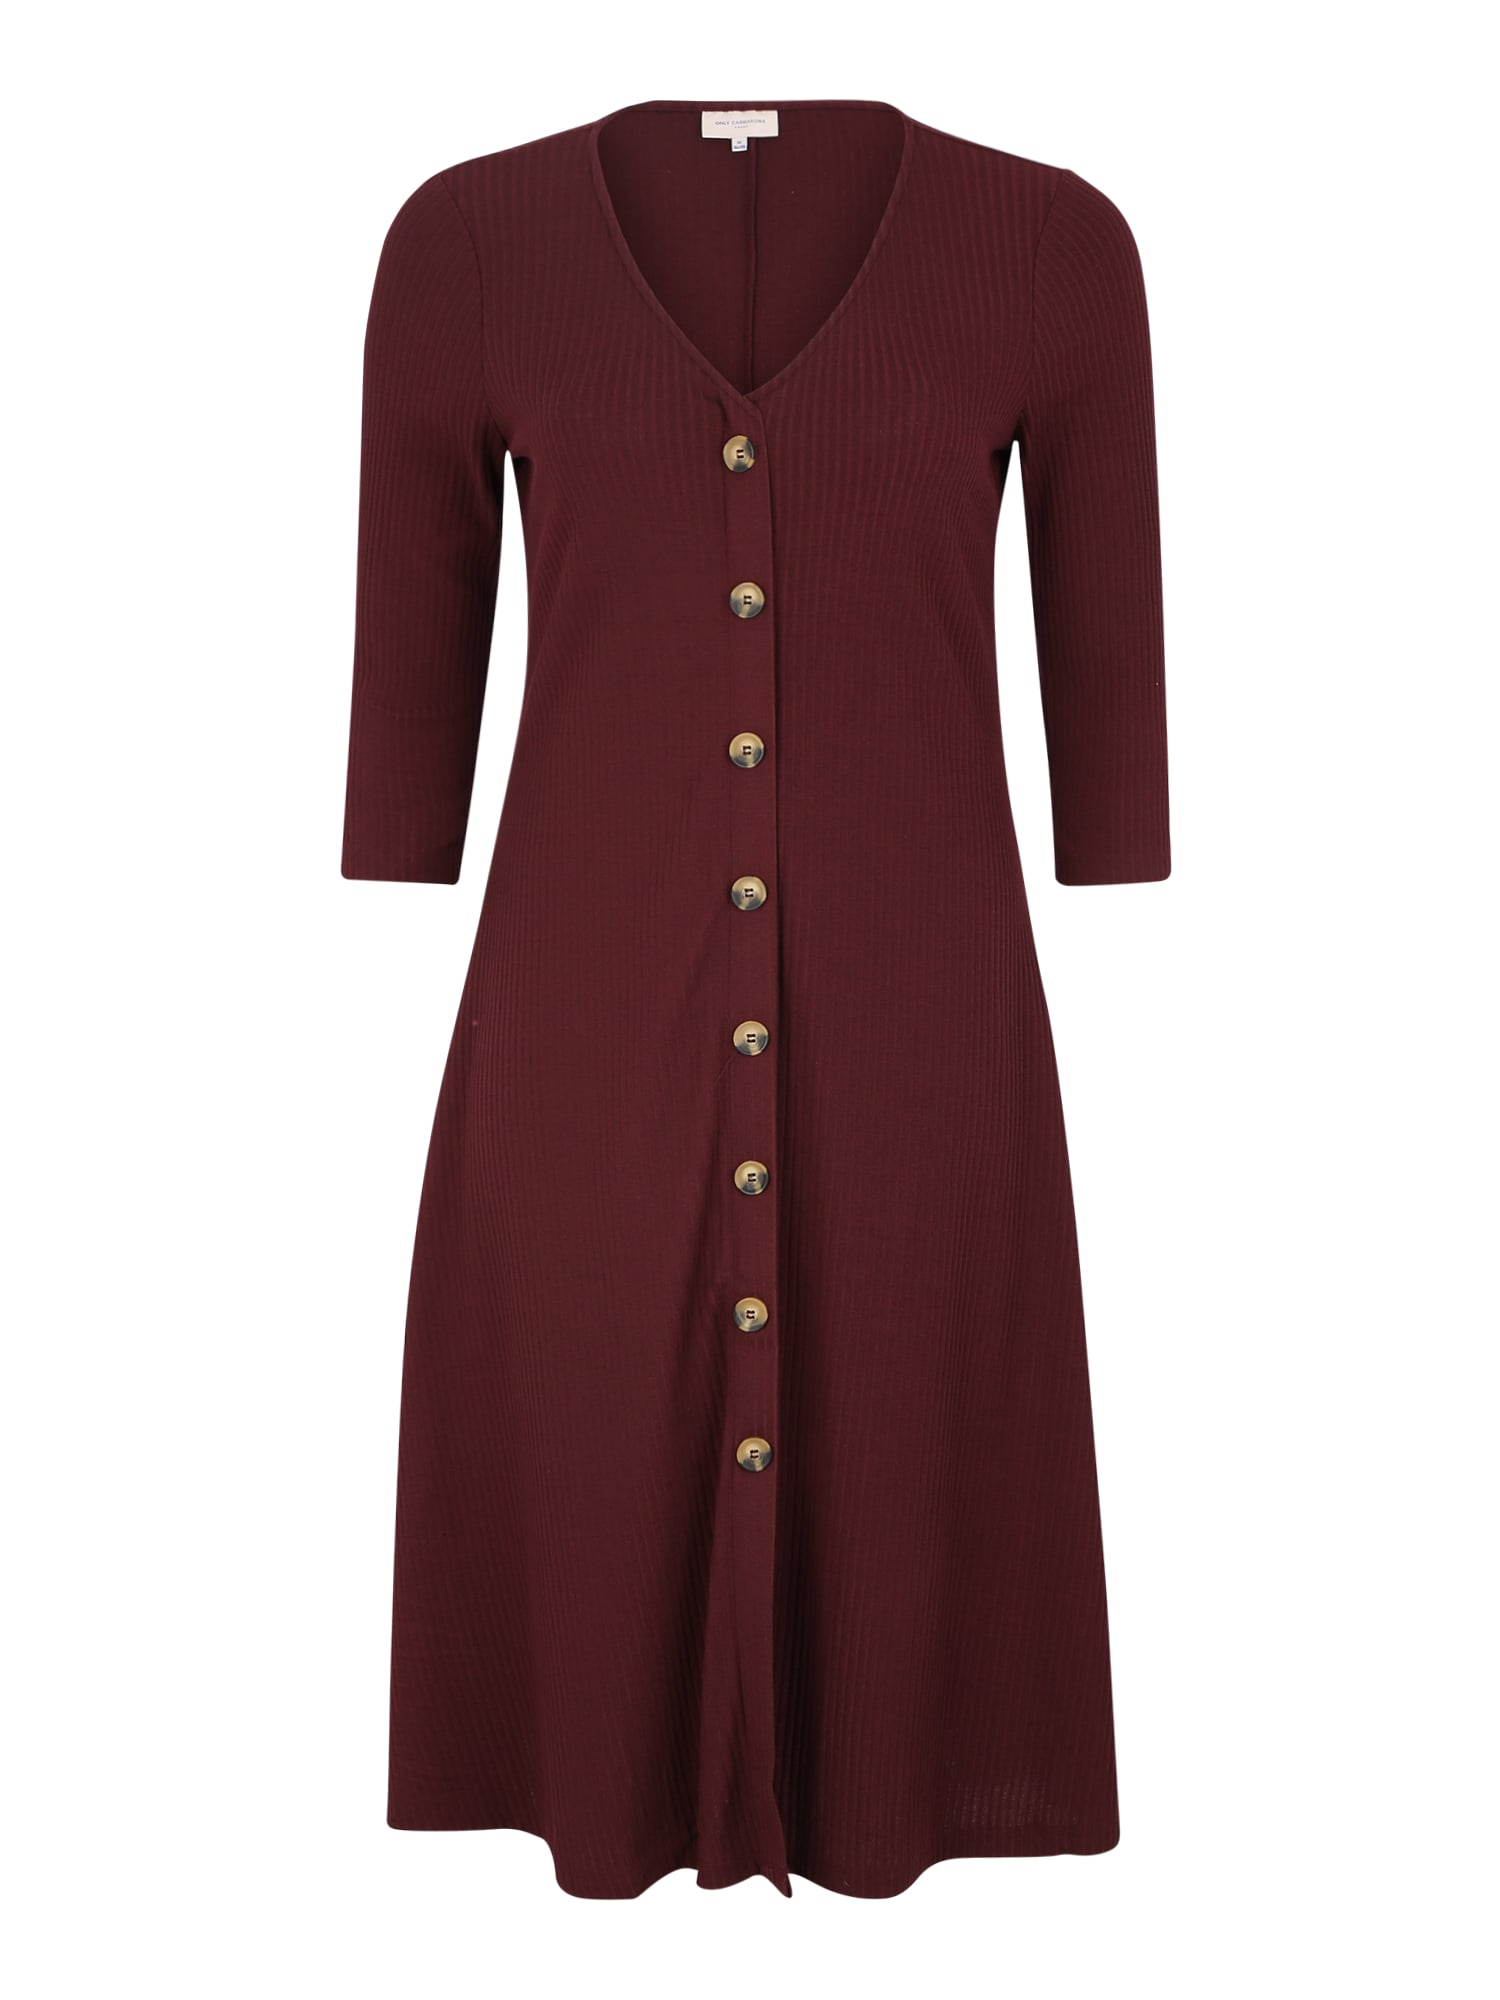 ONLY Carmakoma Megzta suknelė vyno raudona spalva